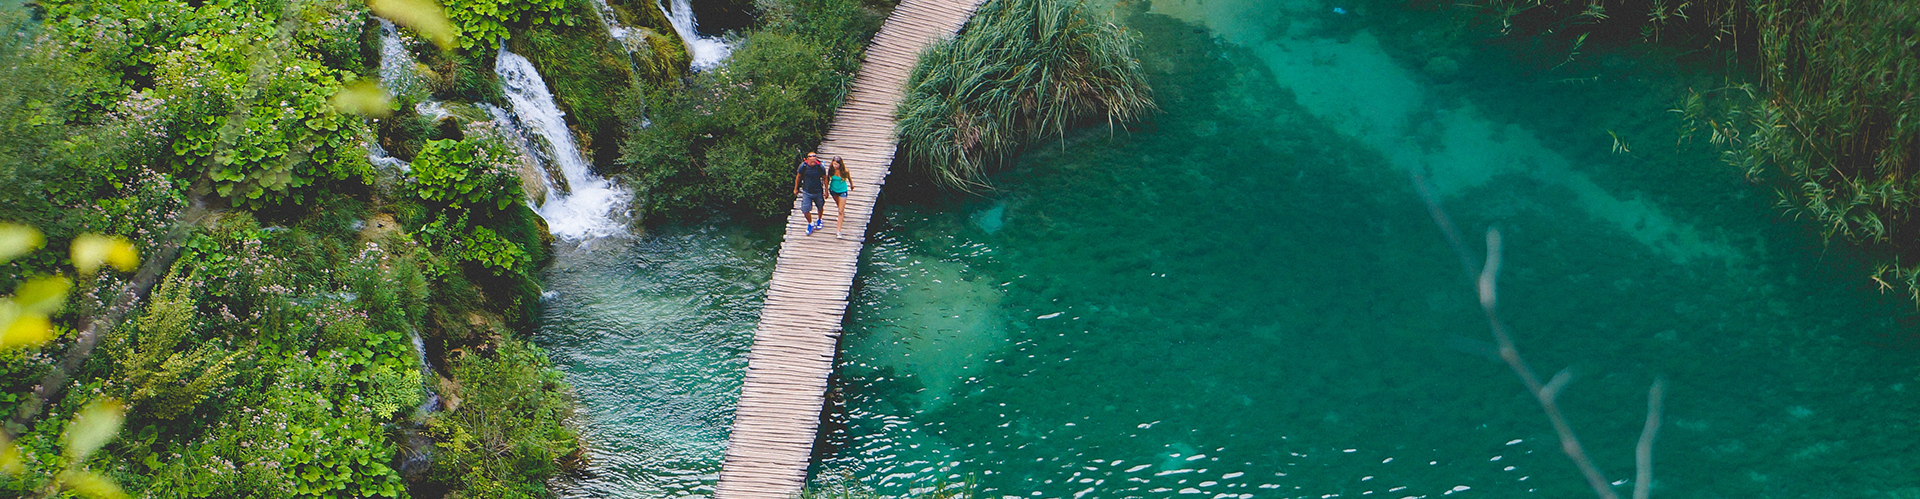 kroatien-urlaub-reiseburo-rosenheim-raubling-kolbermoor-reise-buchen-funtana-banner-2